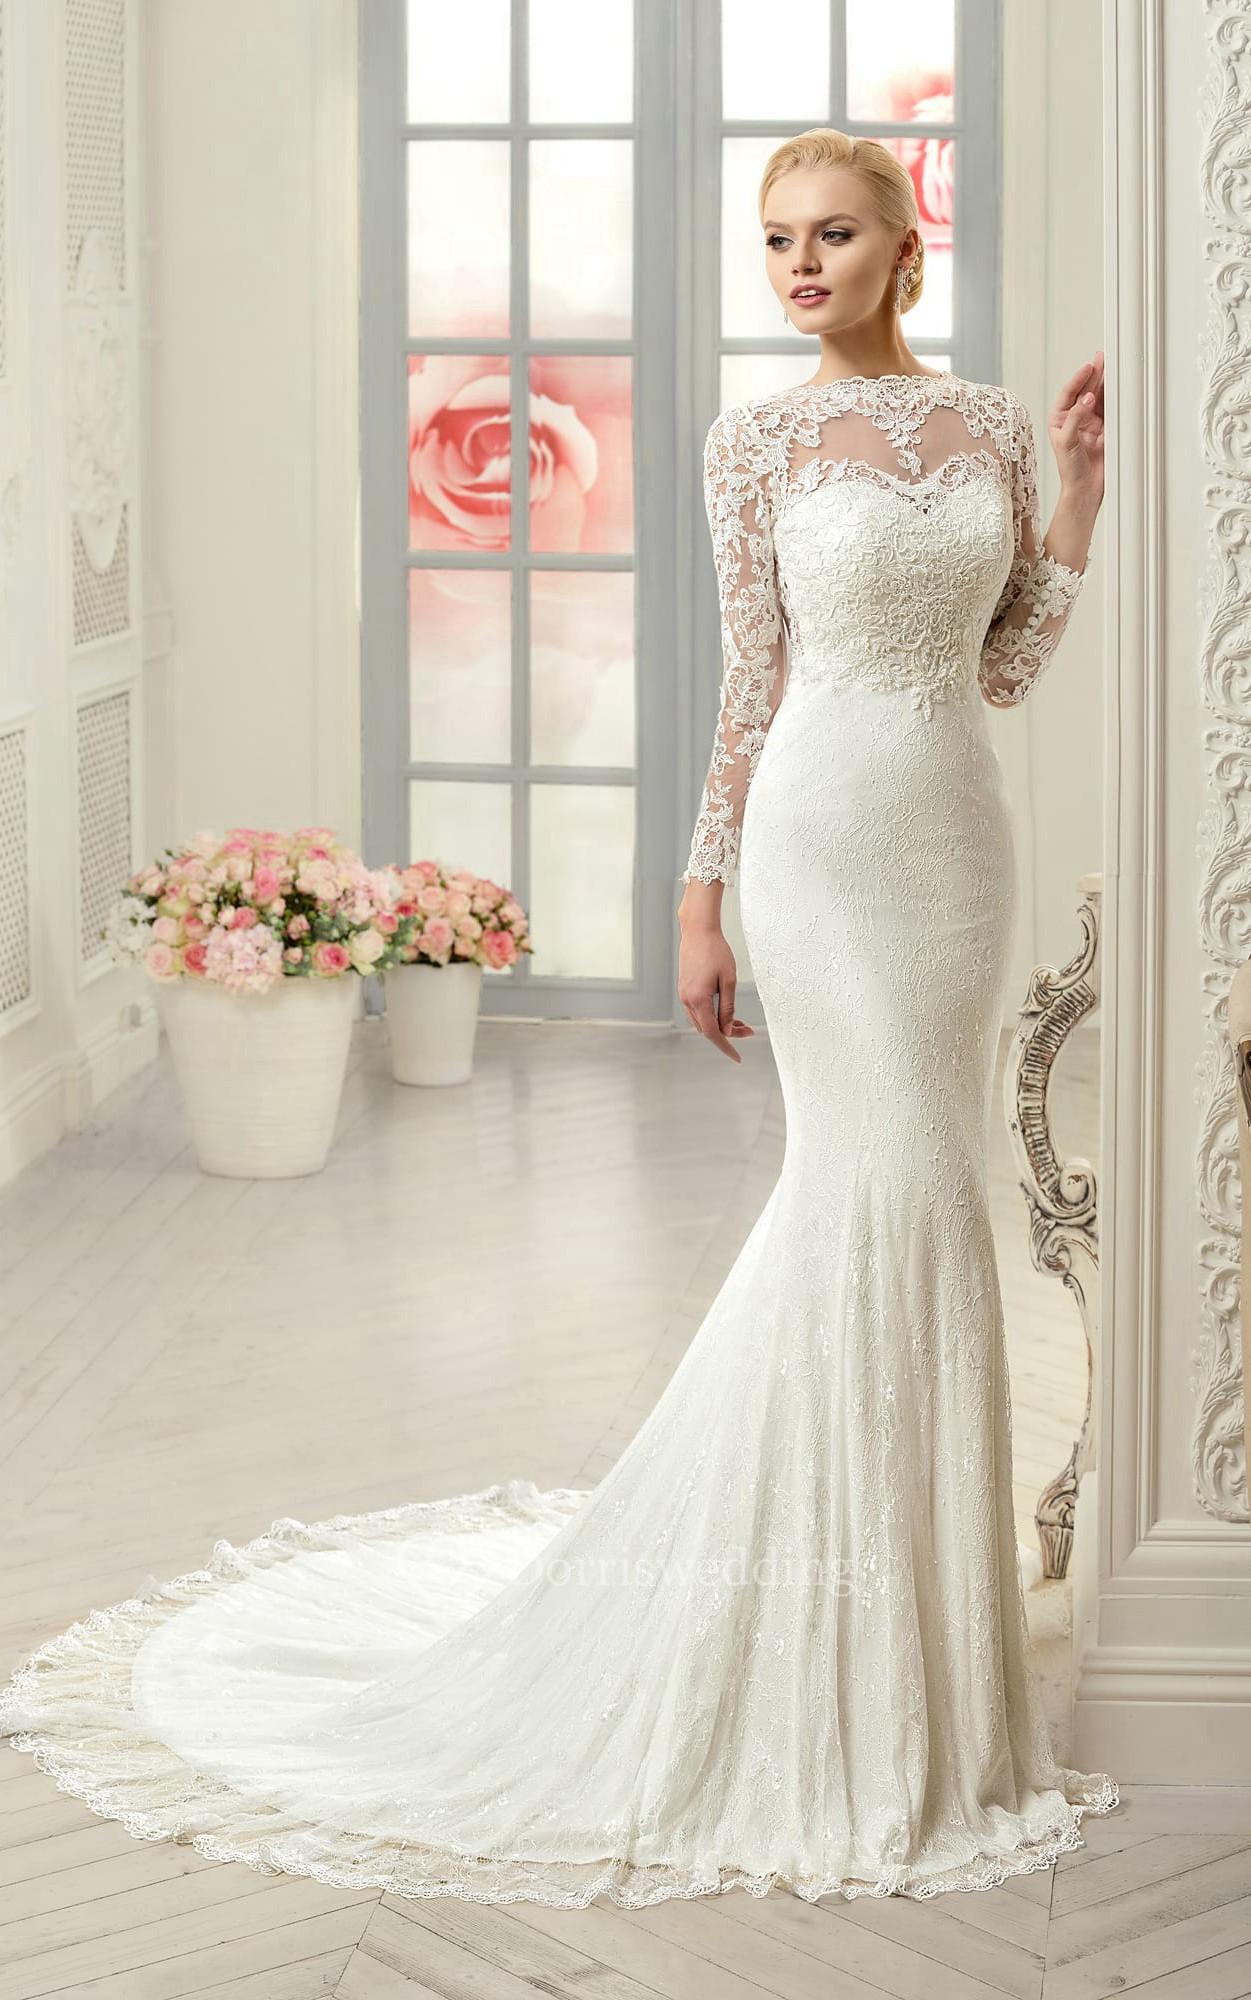 sheath long jewel longsleeve illusion lace dress with